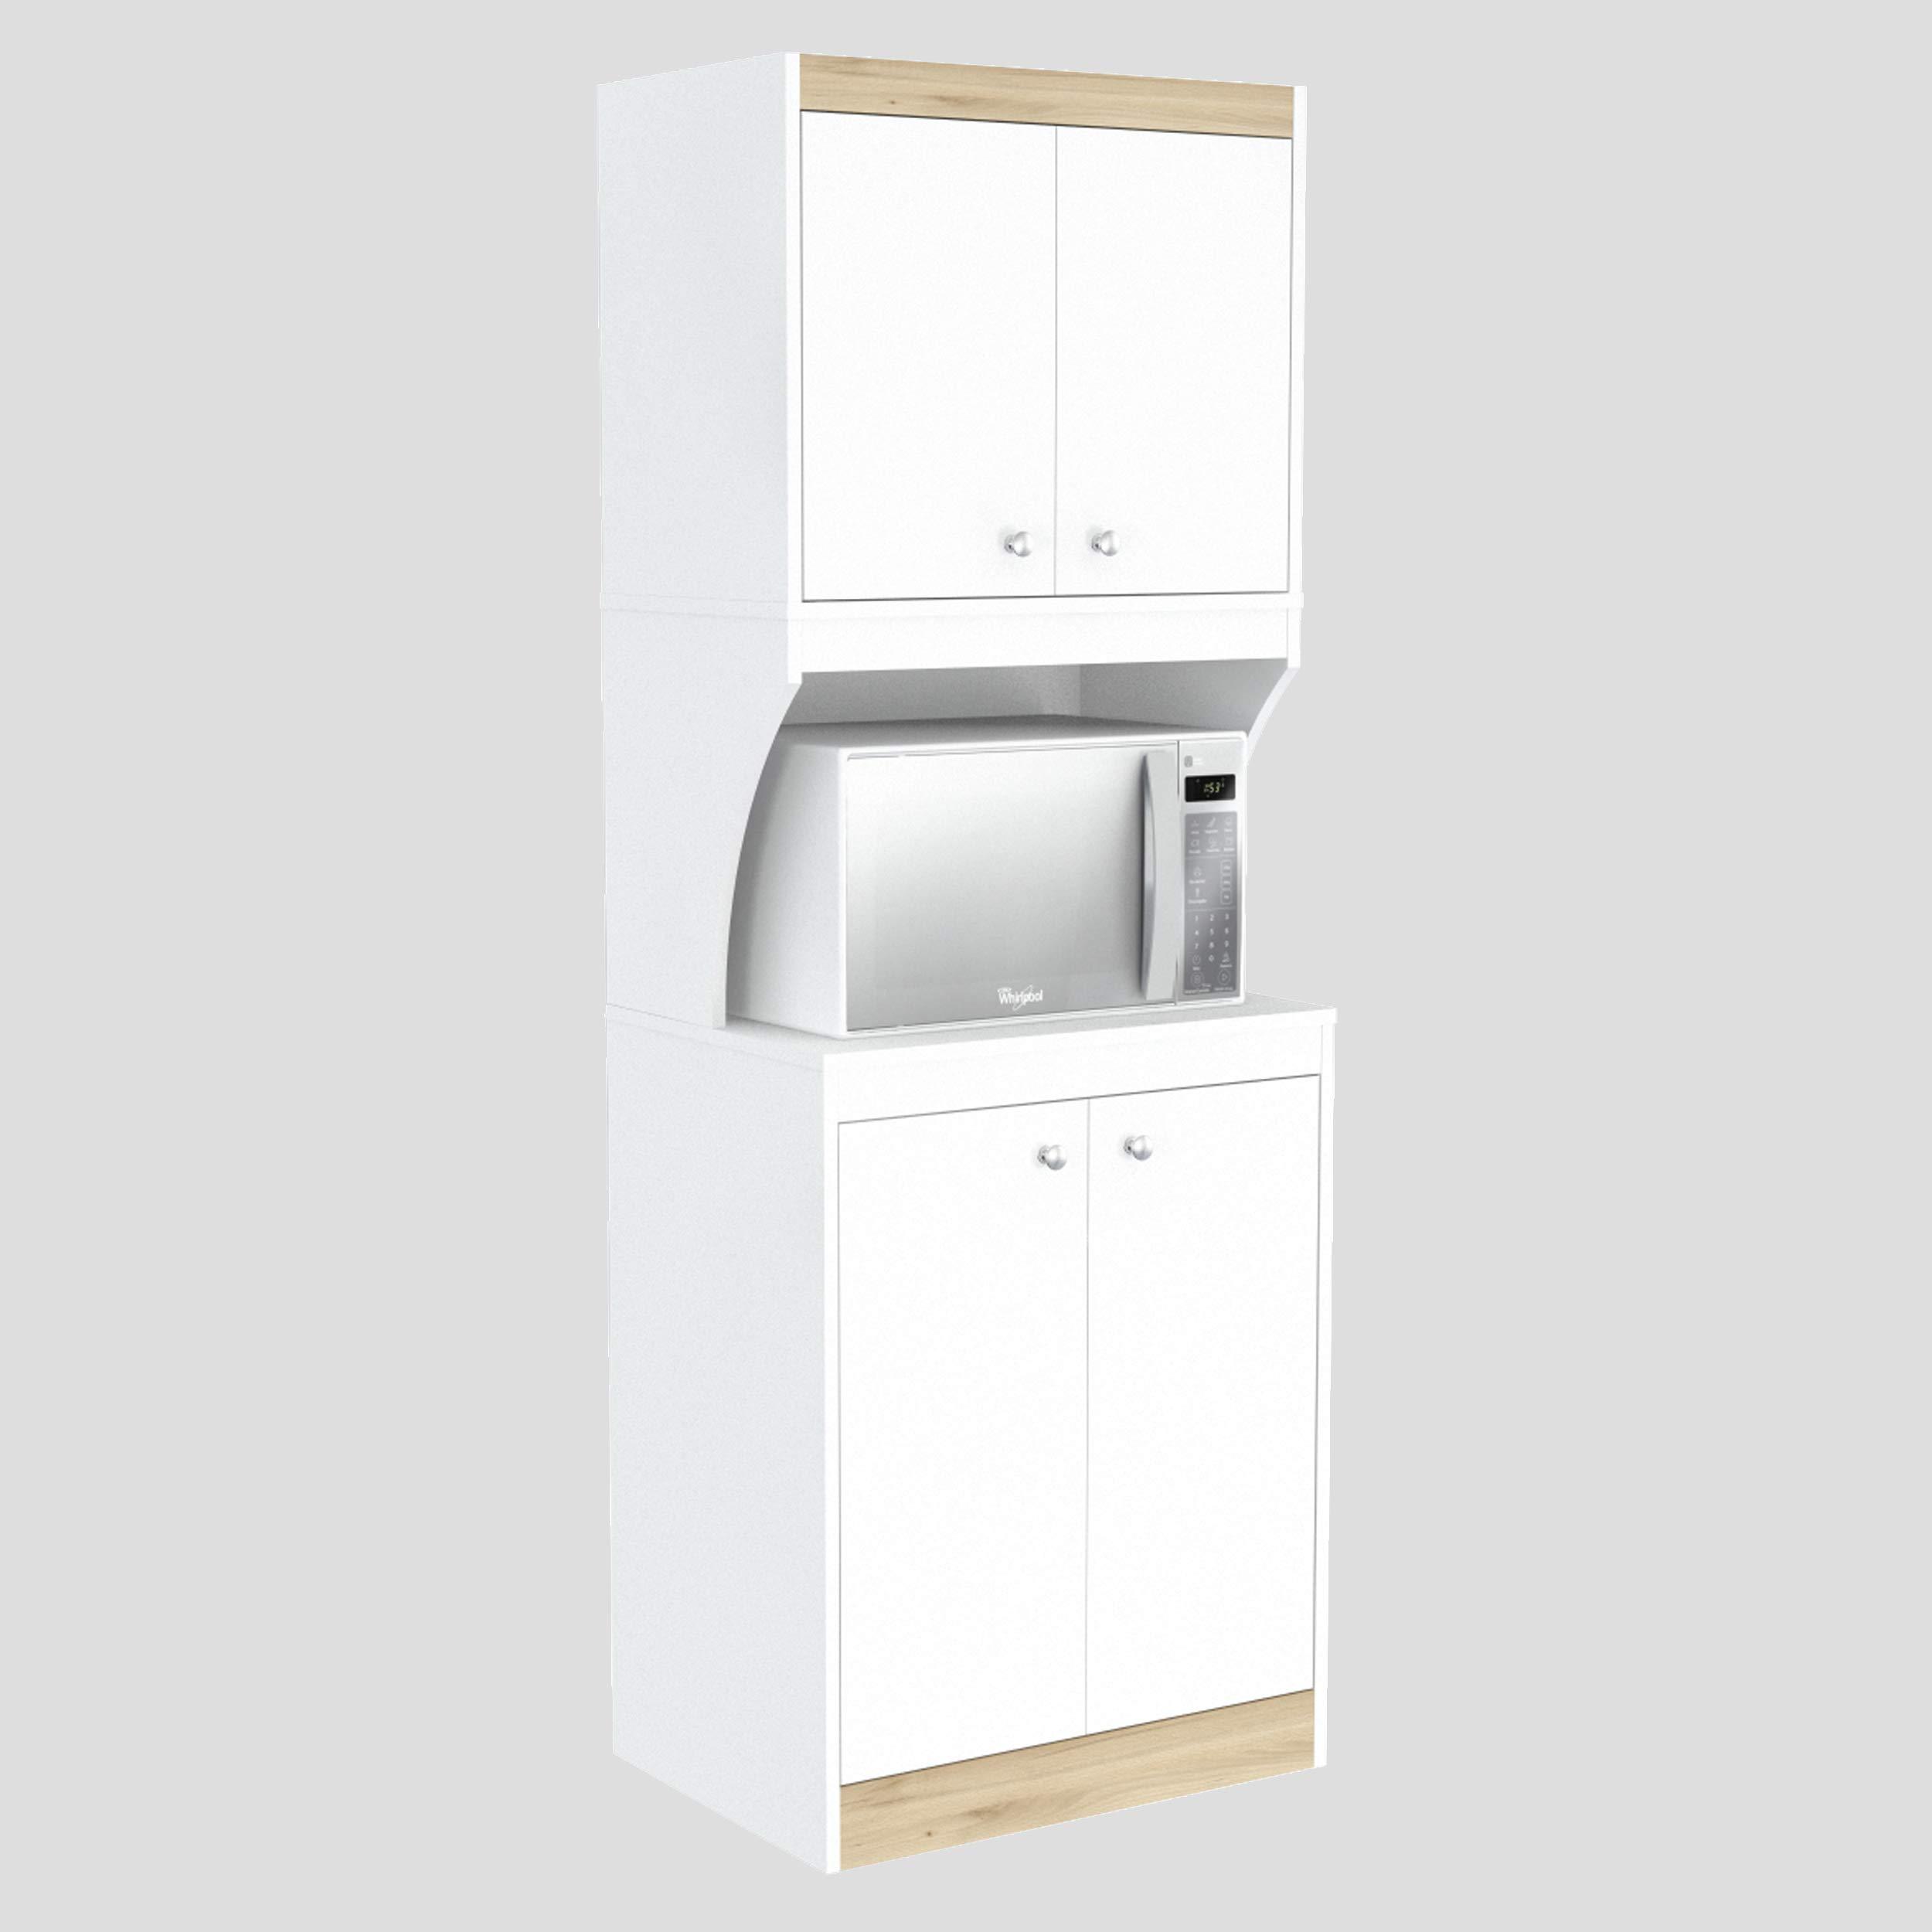 Inval AL-3513 Galley Kitchen/Microwave 4-Door Storage Cabinet, White & Vienes Oak by Inval